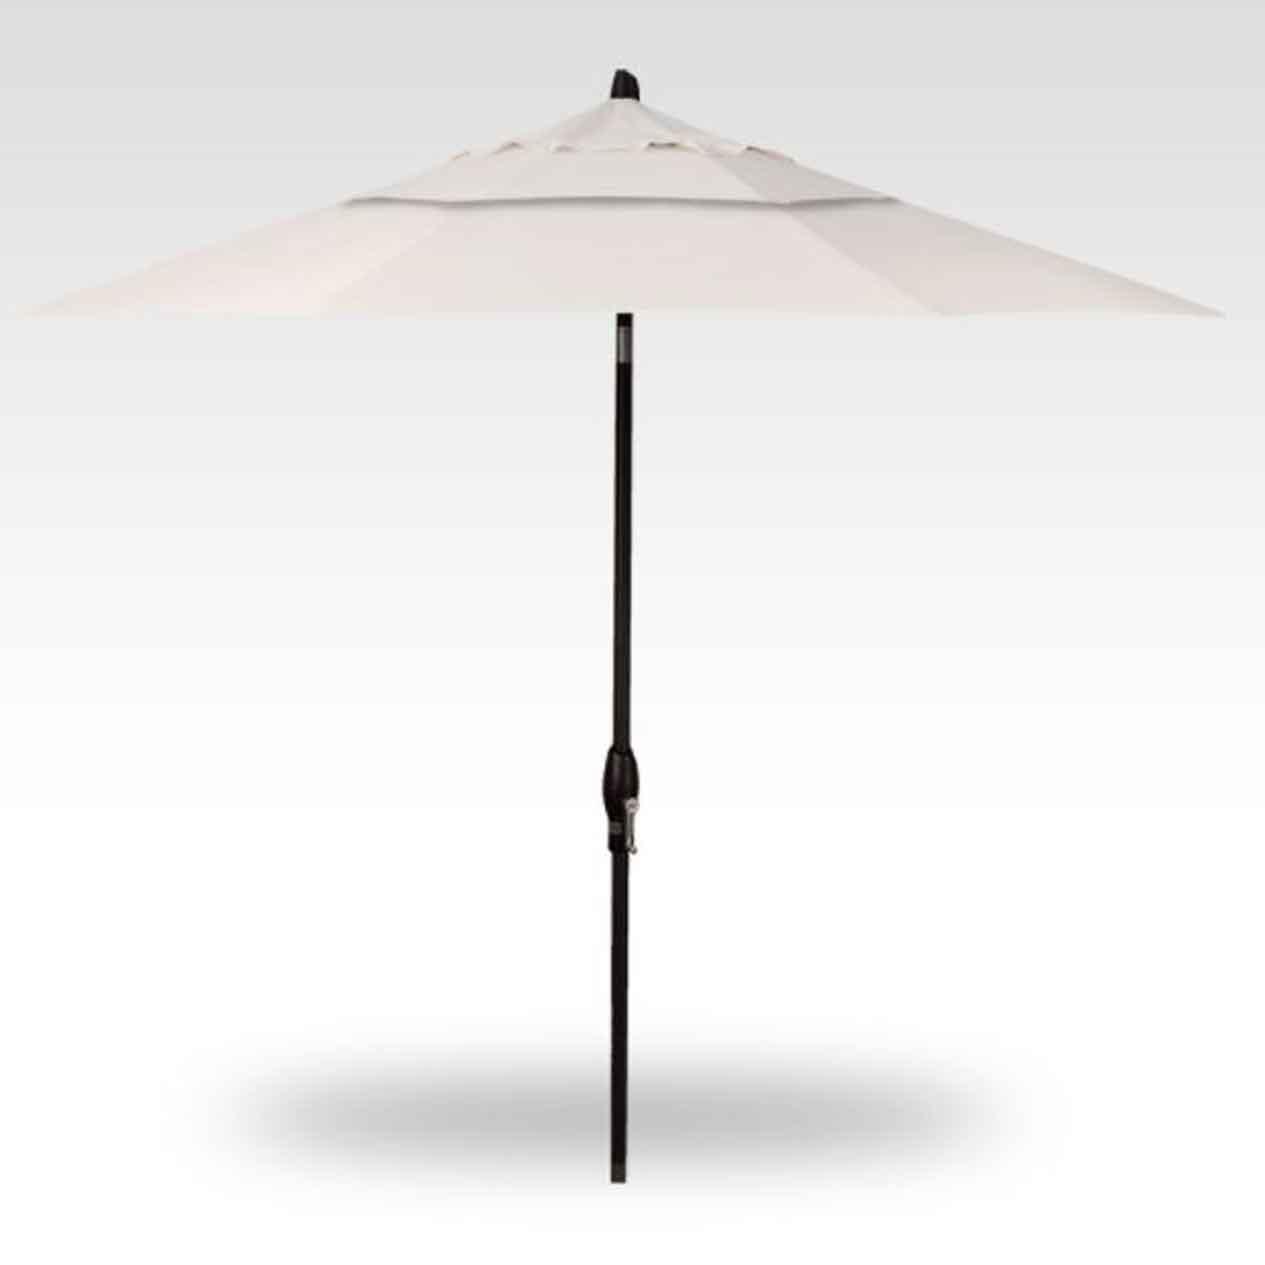 9' Auto Tilt Market Umbrella - Canvas